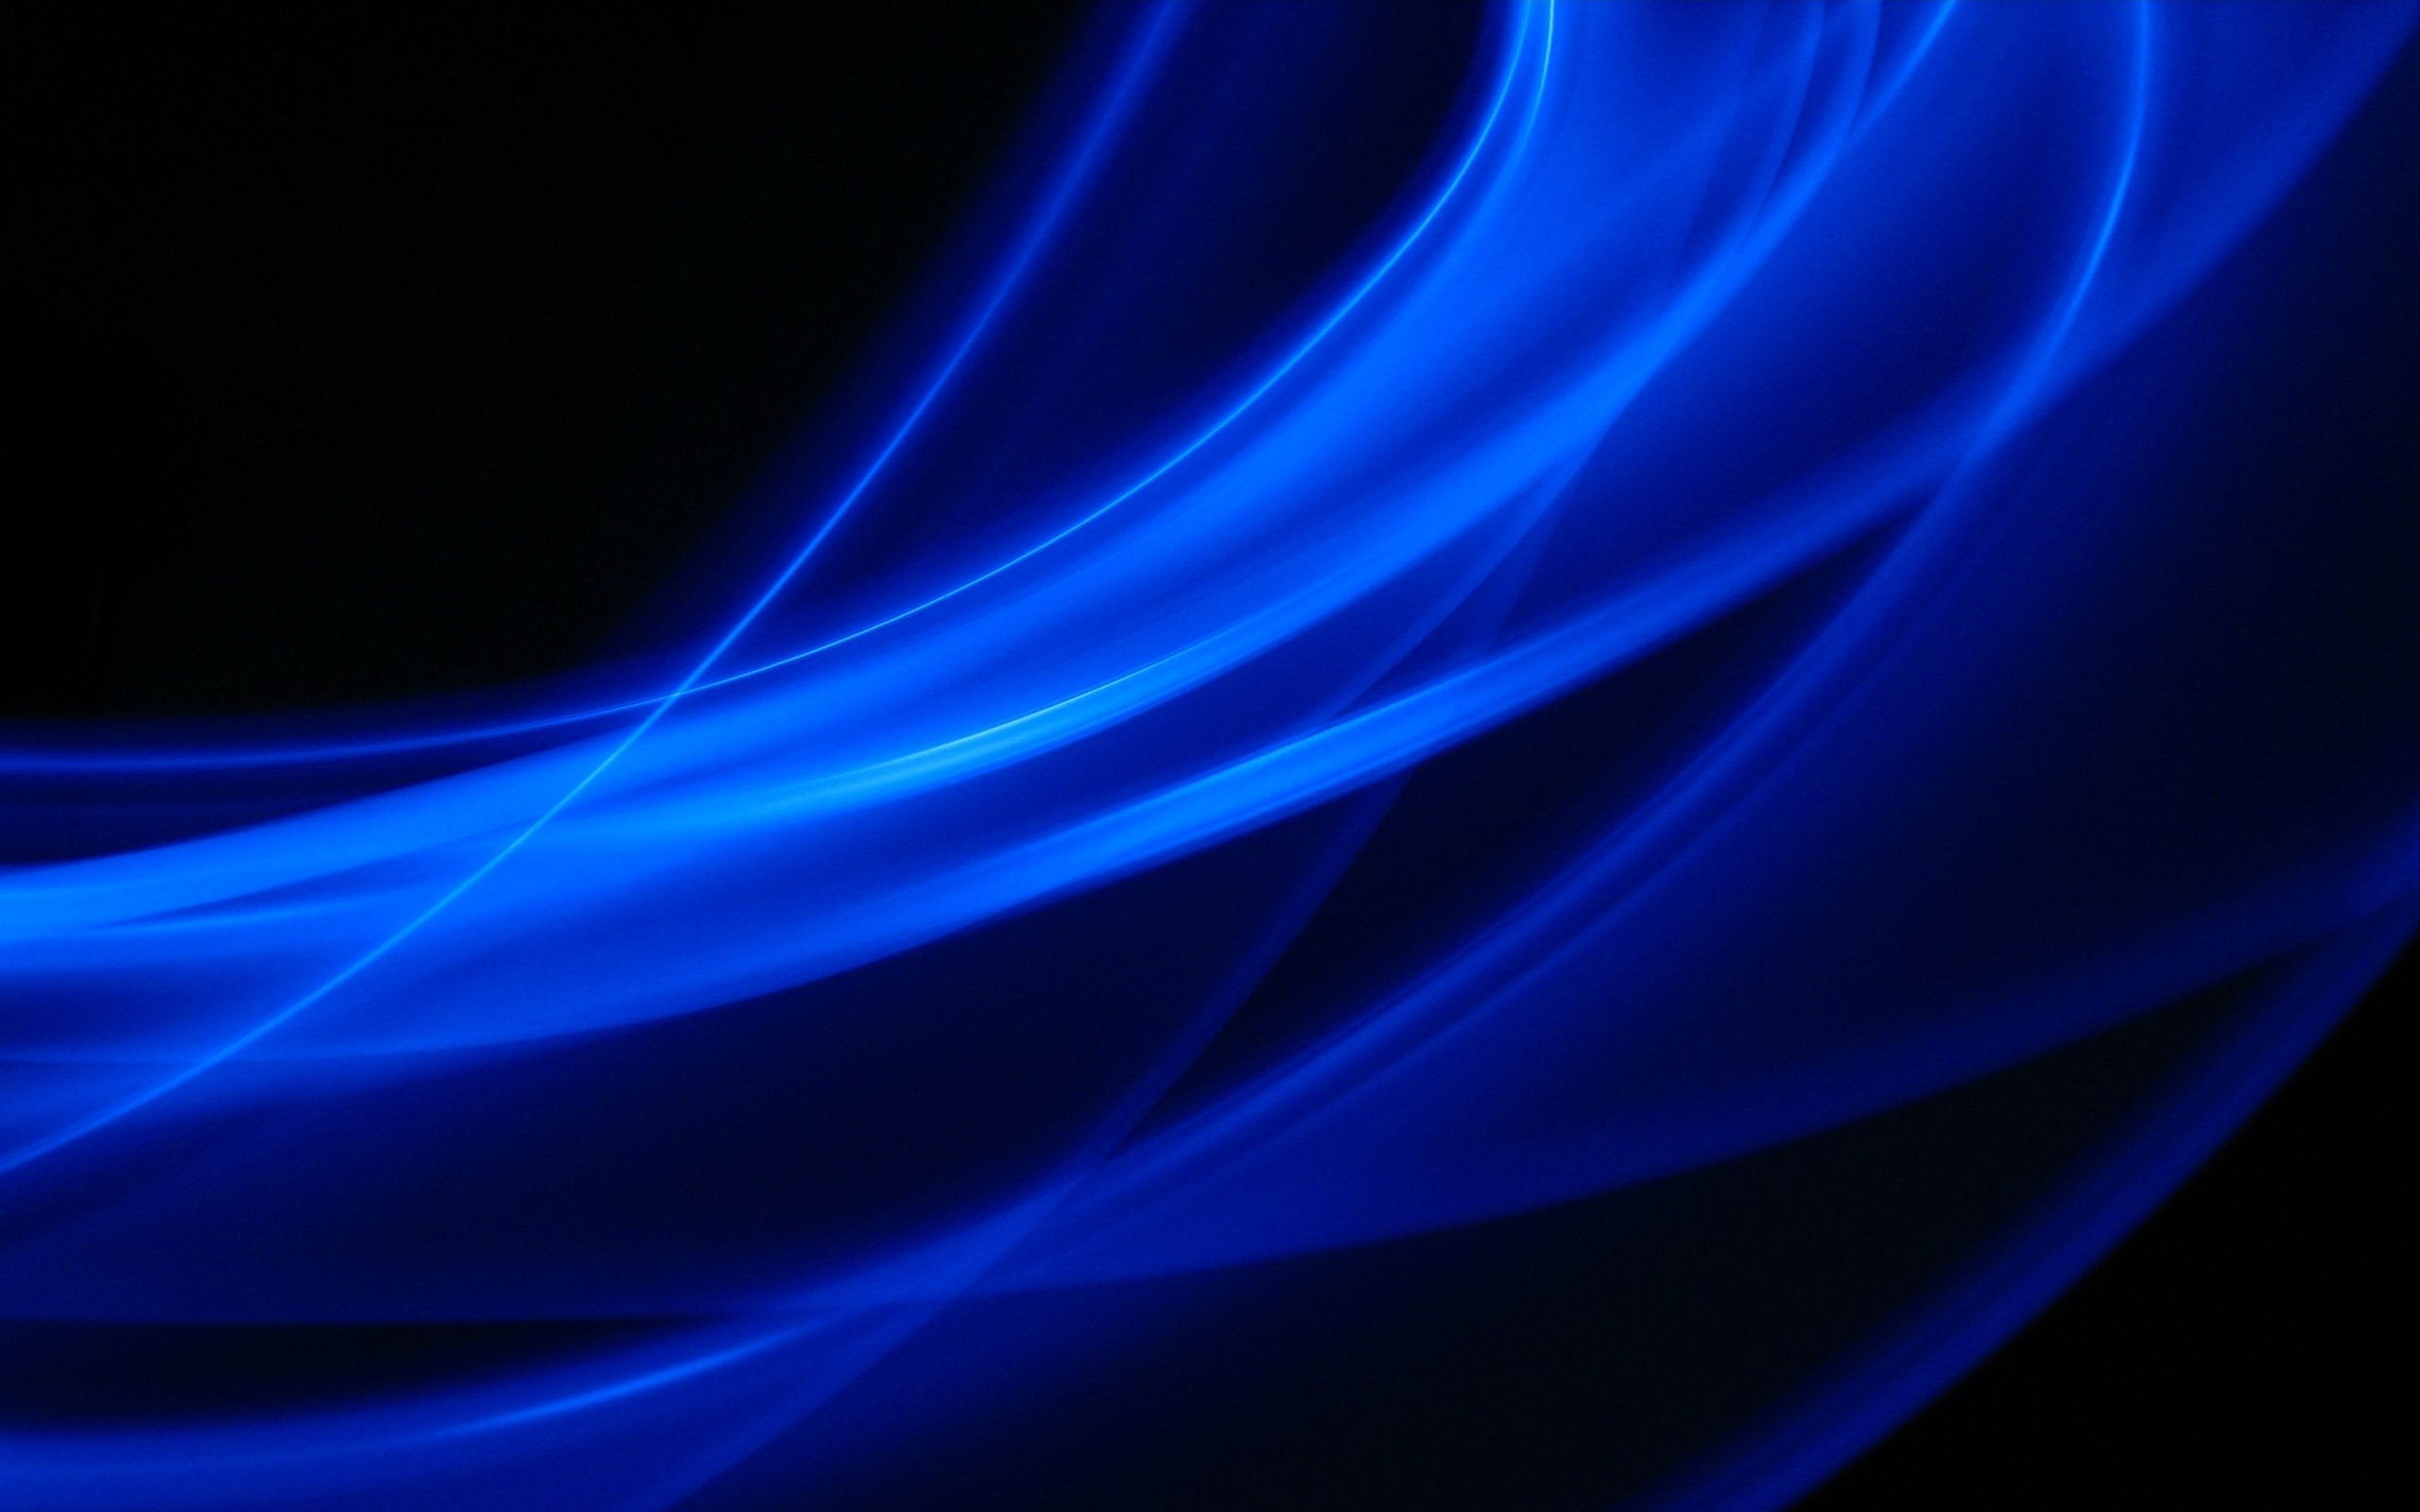 Entp Neon Blue Blue Background Wallpapers Dark Blue Wallpaper Blue Wallpapers